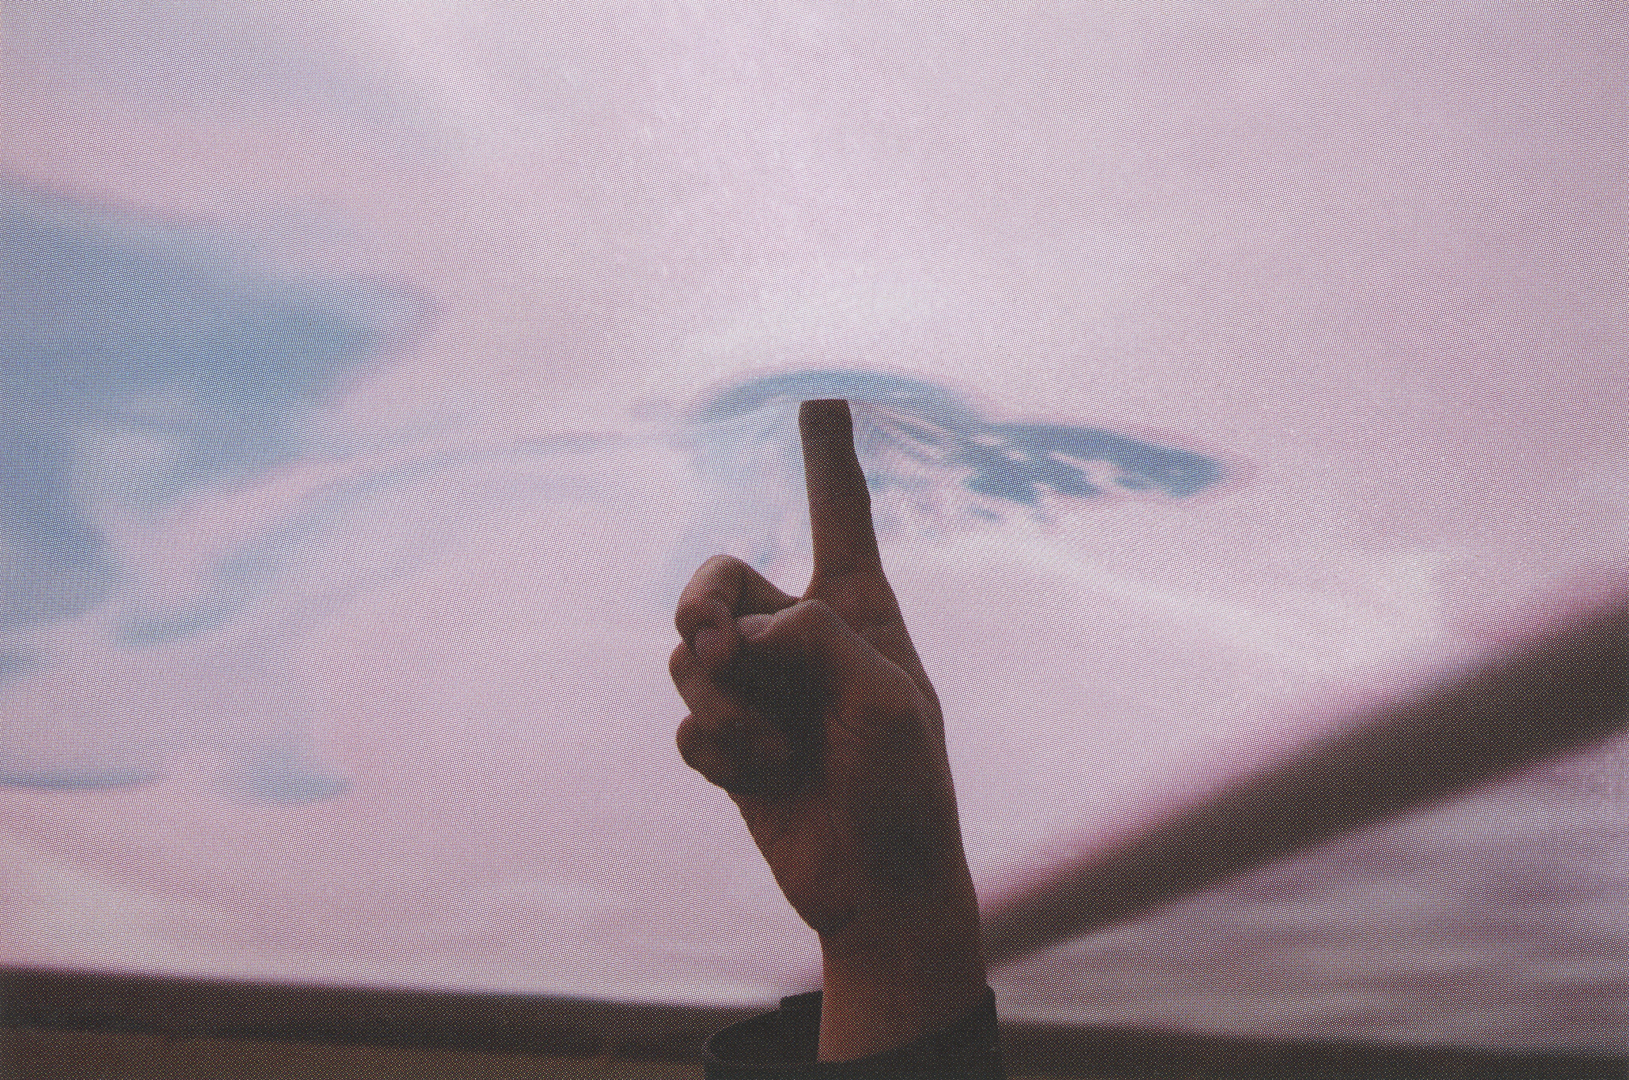 ©2012, Yunsil Heo and Hyunwoo Bang, Cloud Pink